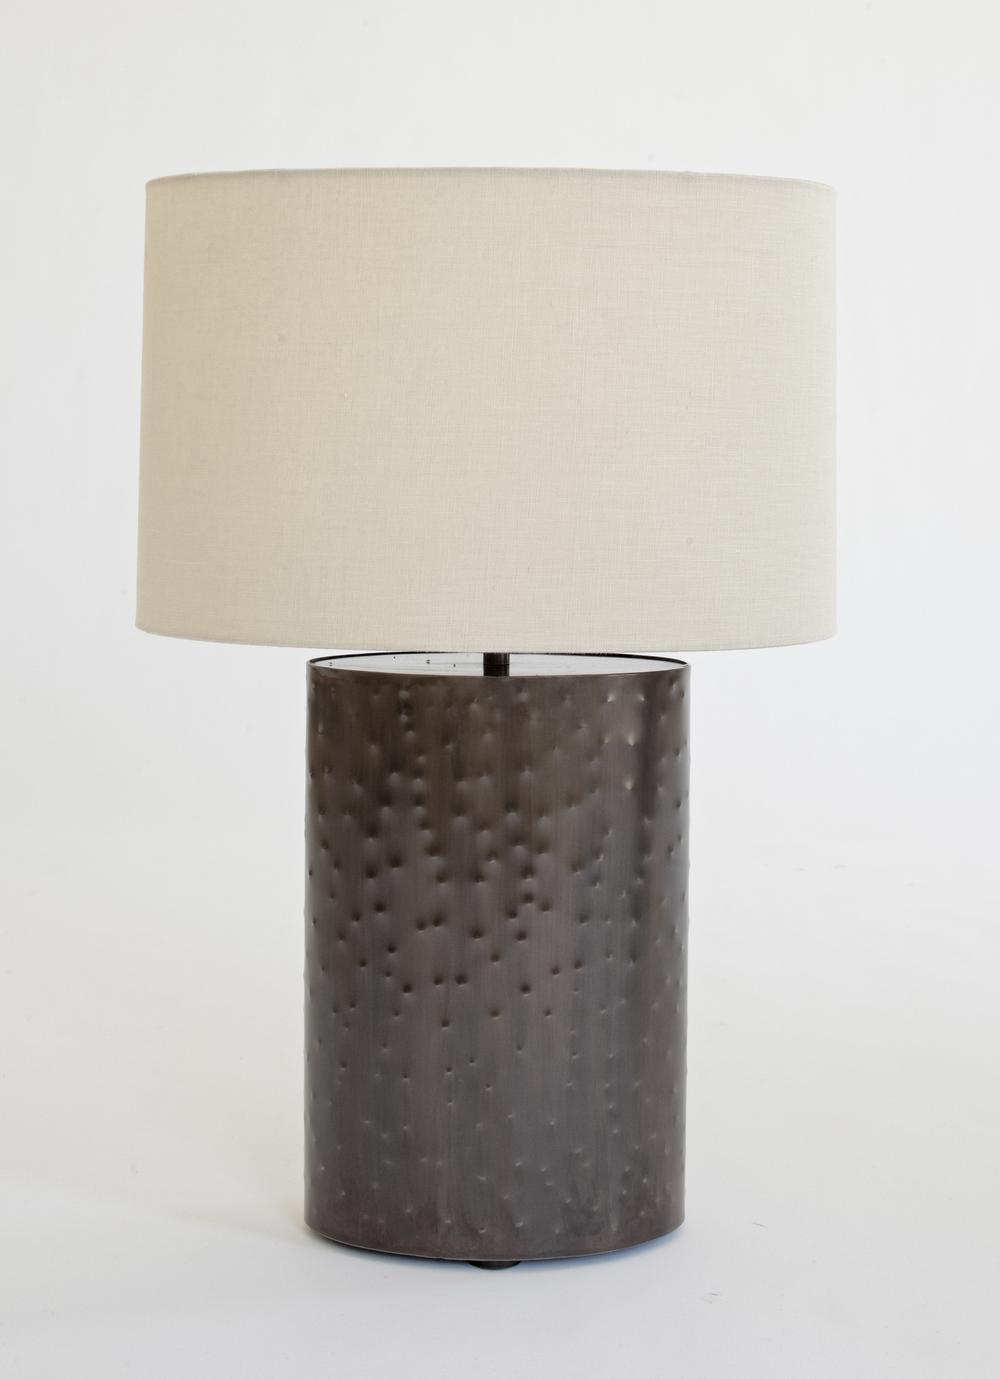 Fiole Lamp